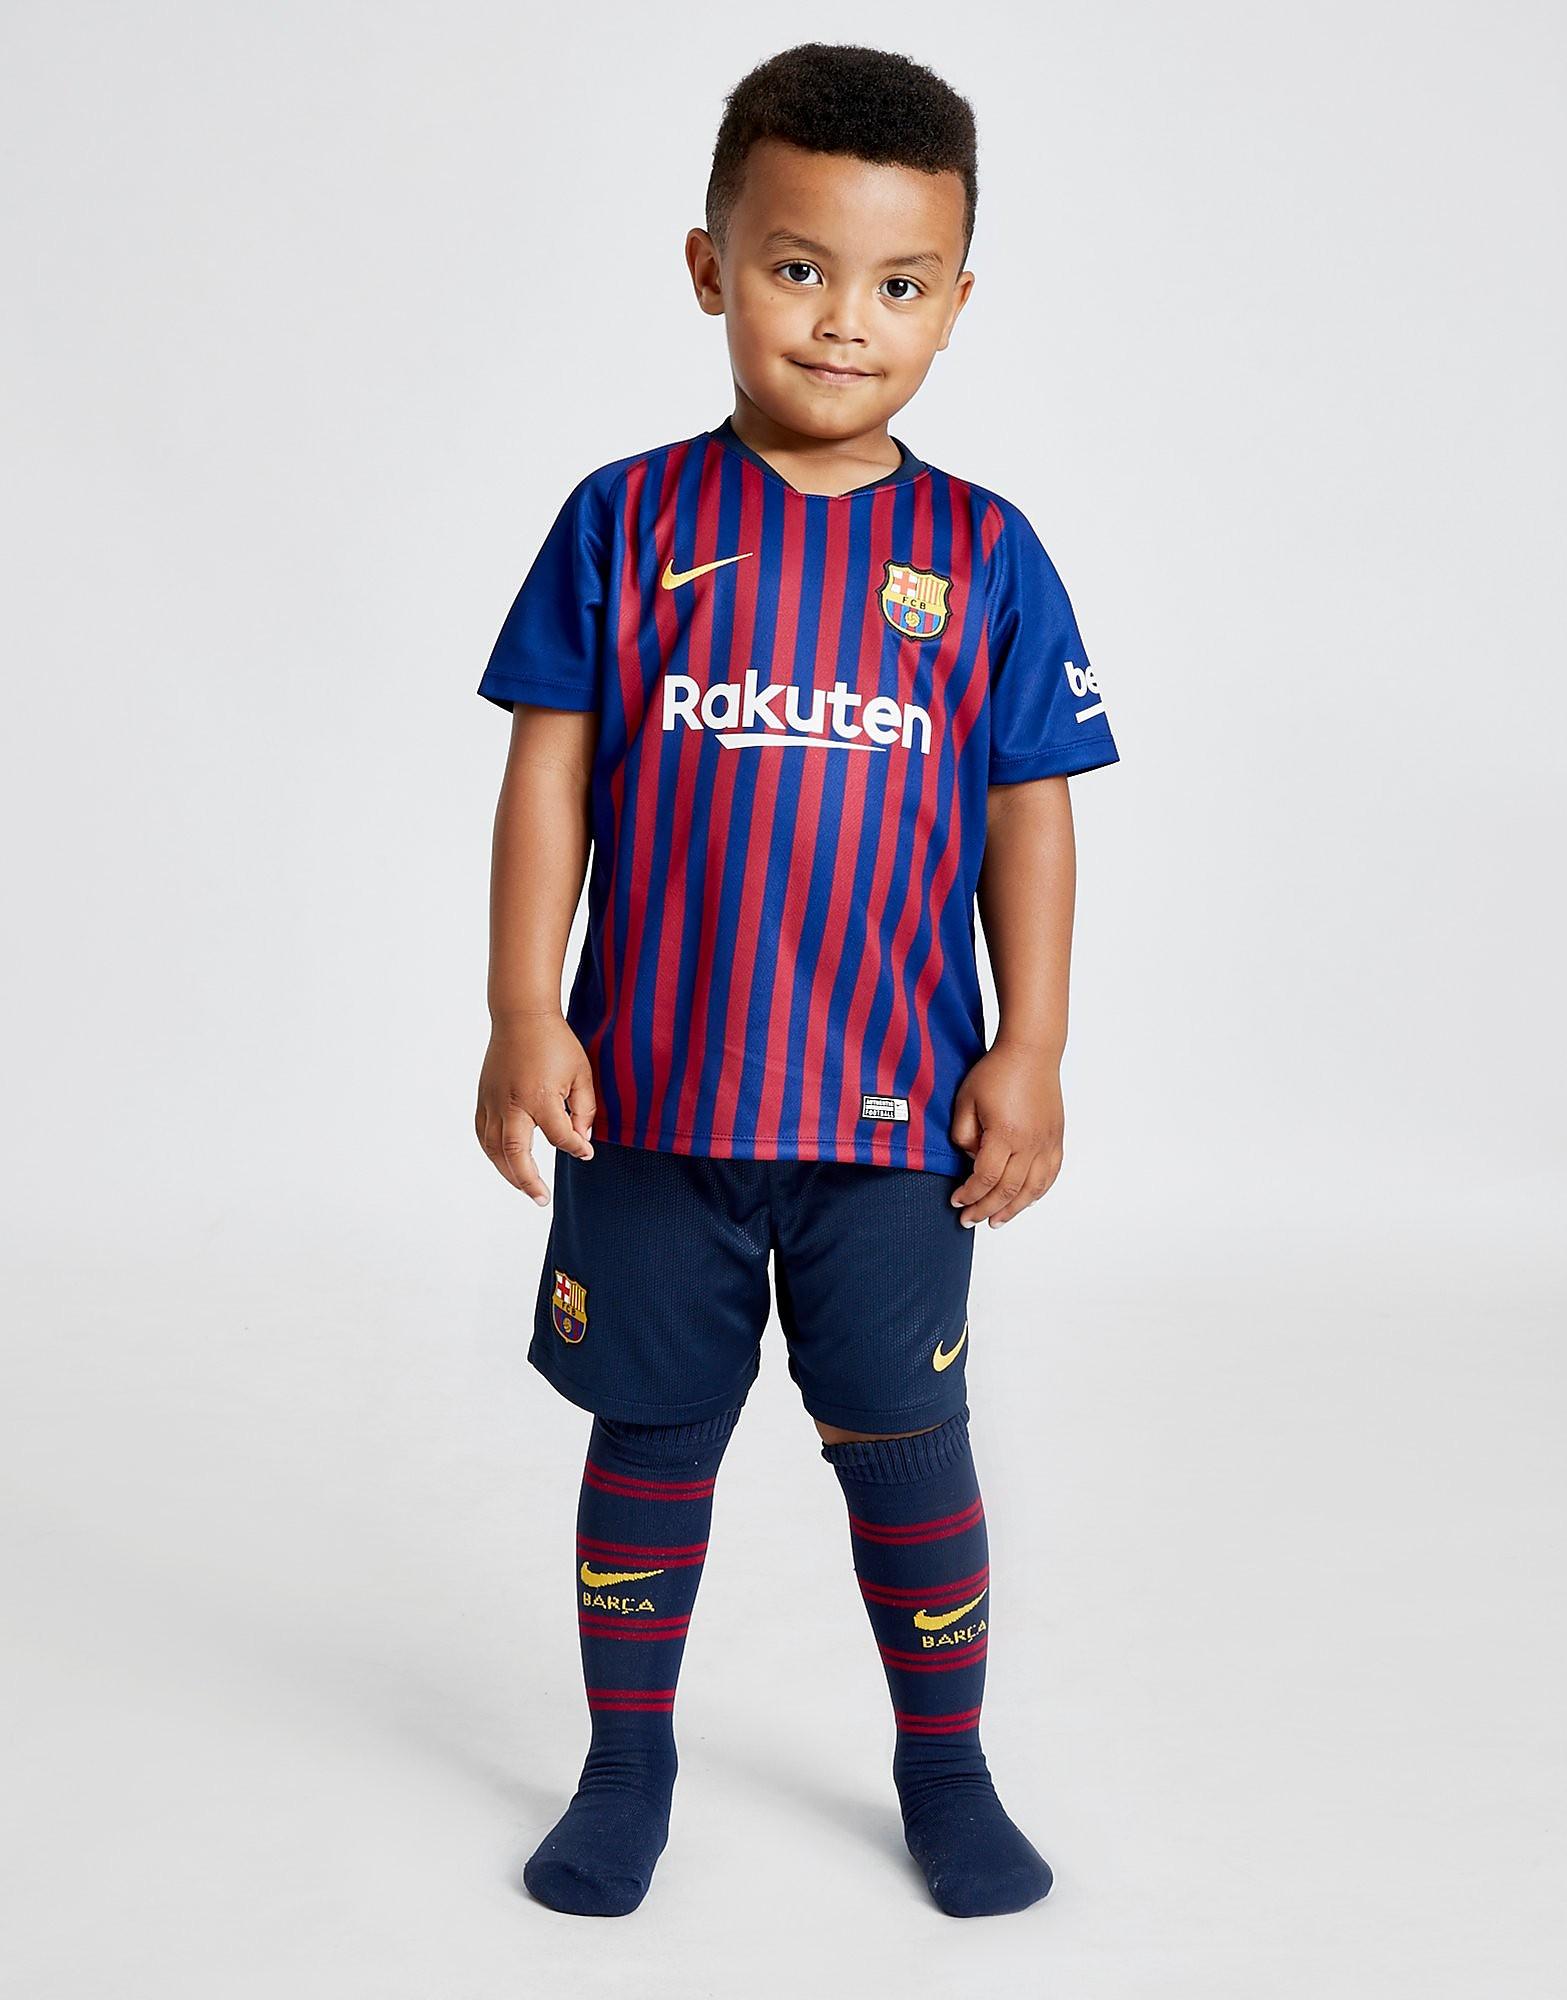 Nike FC Barcelona 2018/19 Home Kit Kinderen - Blauw - Kind